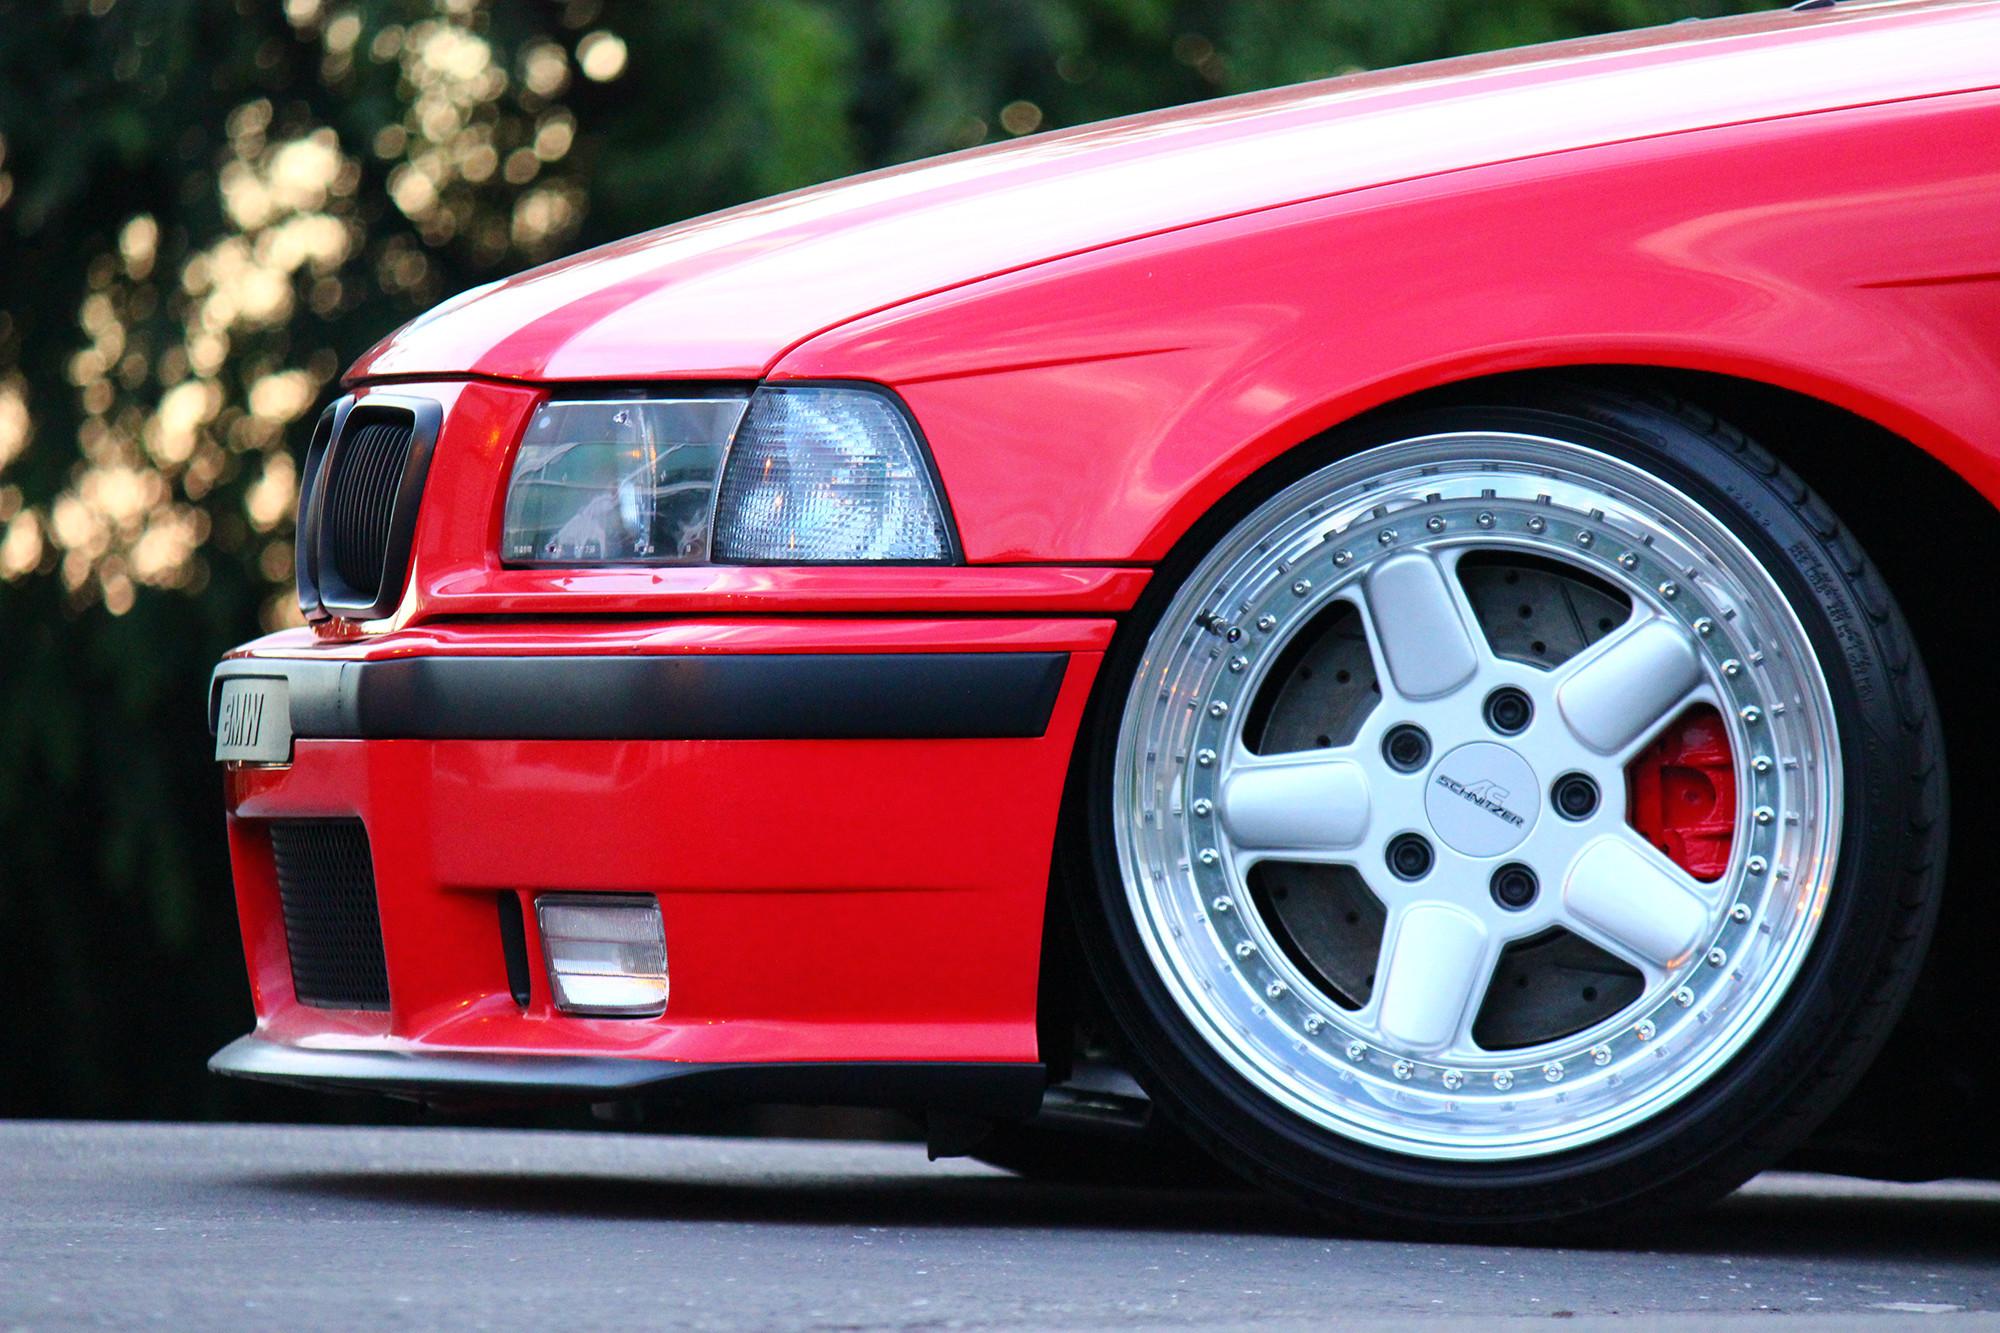 Prestige Motors Pre Owned 1998 BMW E36 M3 Sedan for Sale